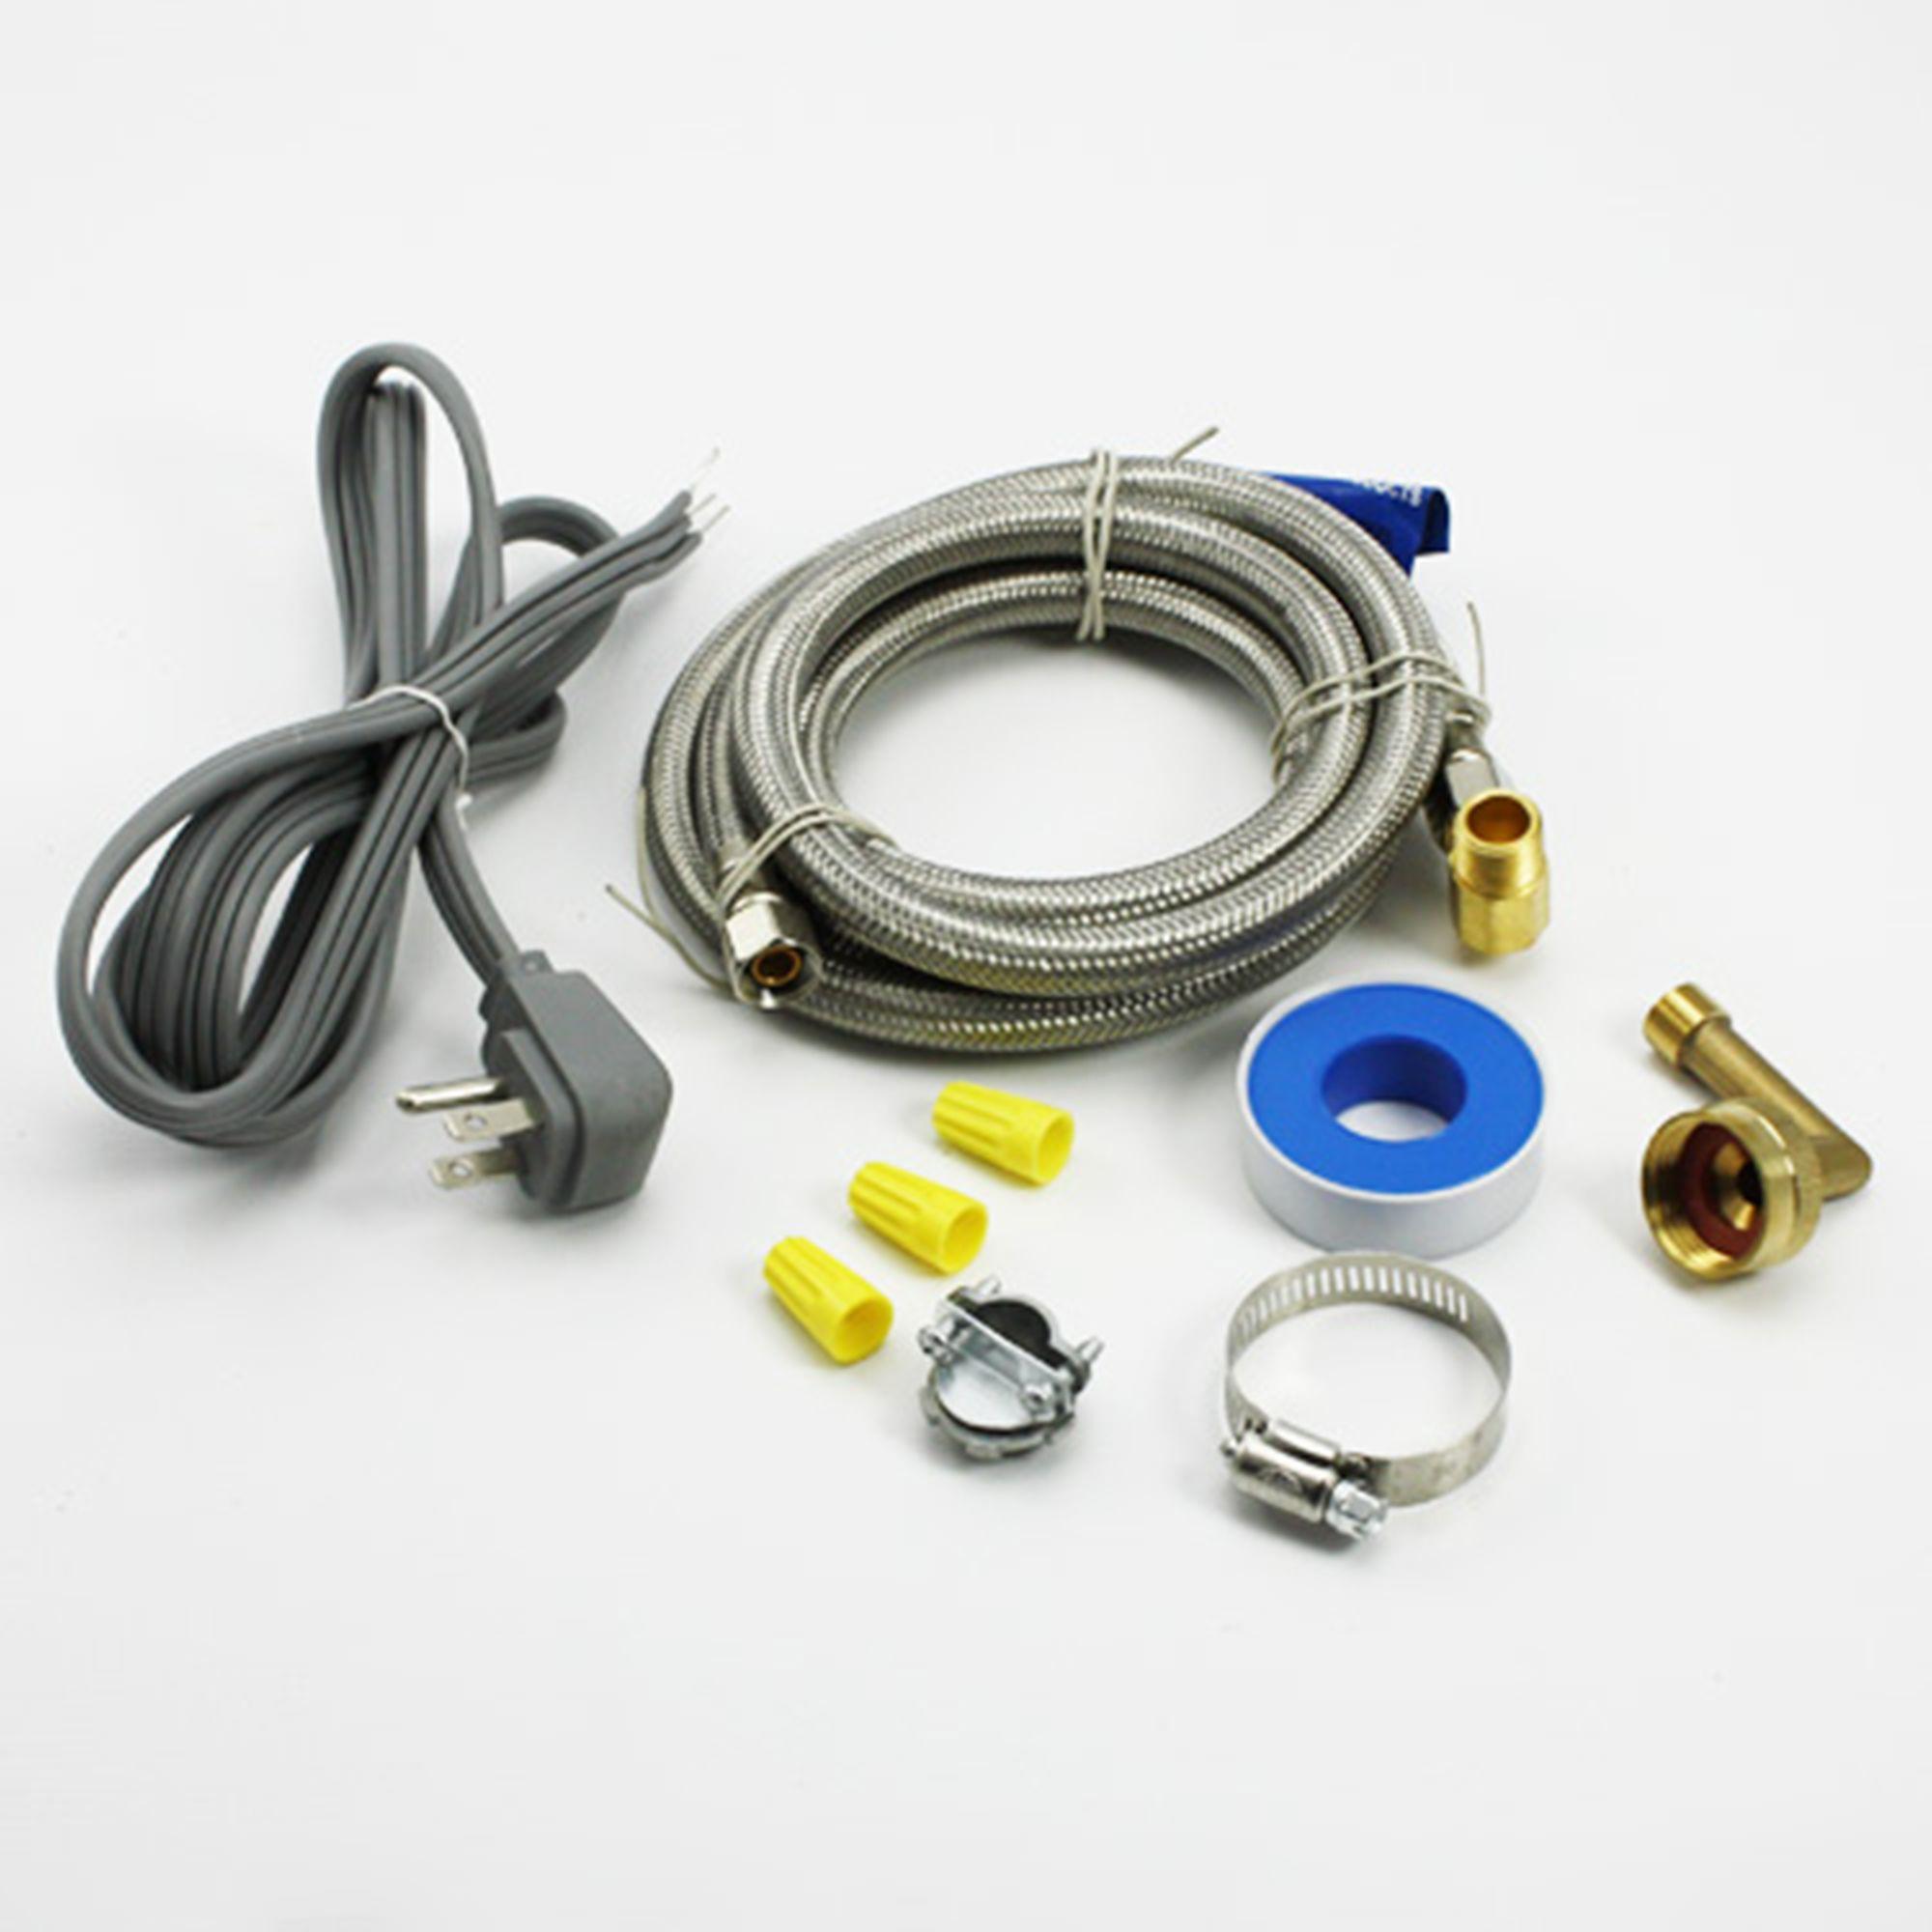 universal dishwasher installation kit 6572 for ge frigidaire whirlpool maytag lg ebay. Black Bedroom Furniture Sets. Home Design Ideas